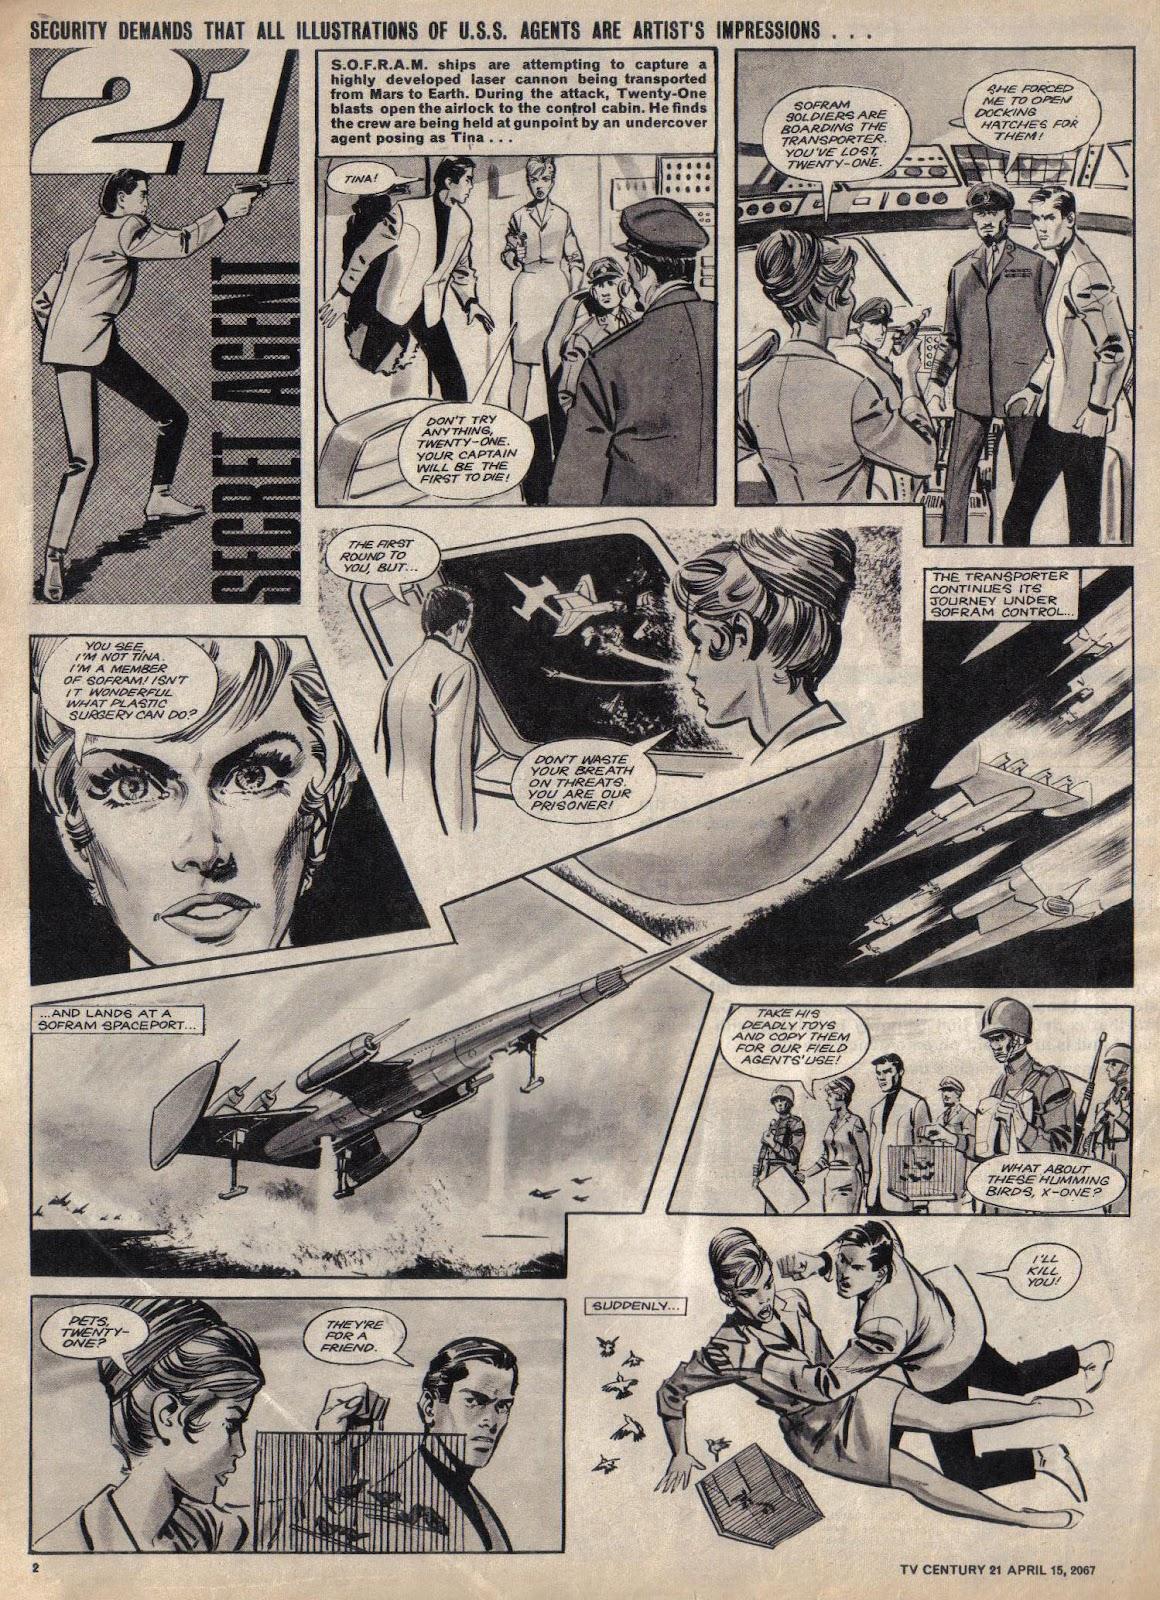 TV Century 21 (TV 21) issue 117 - Page 2